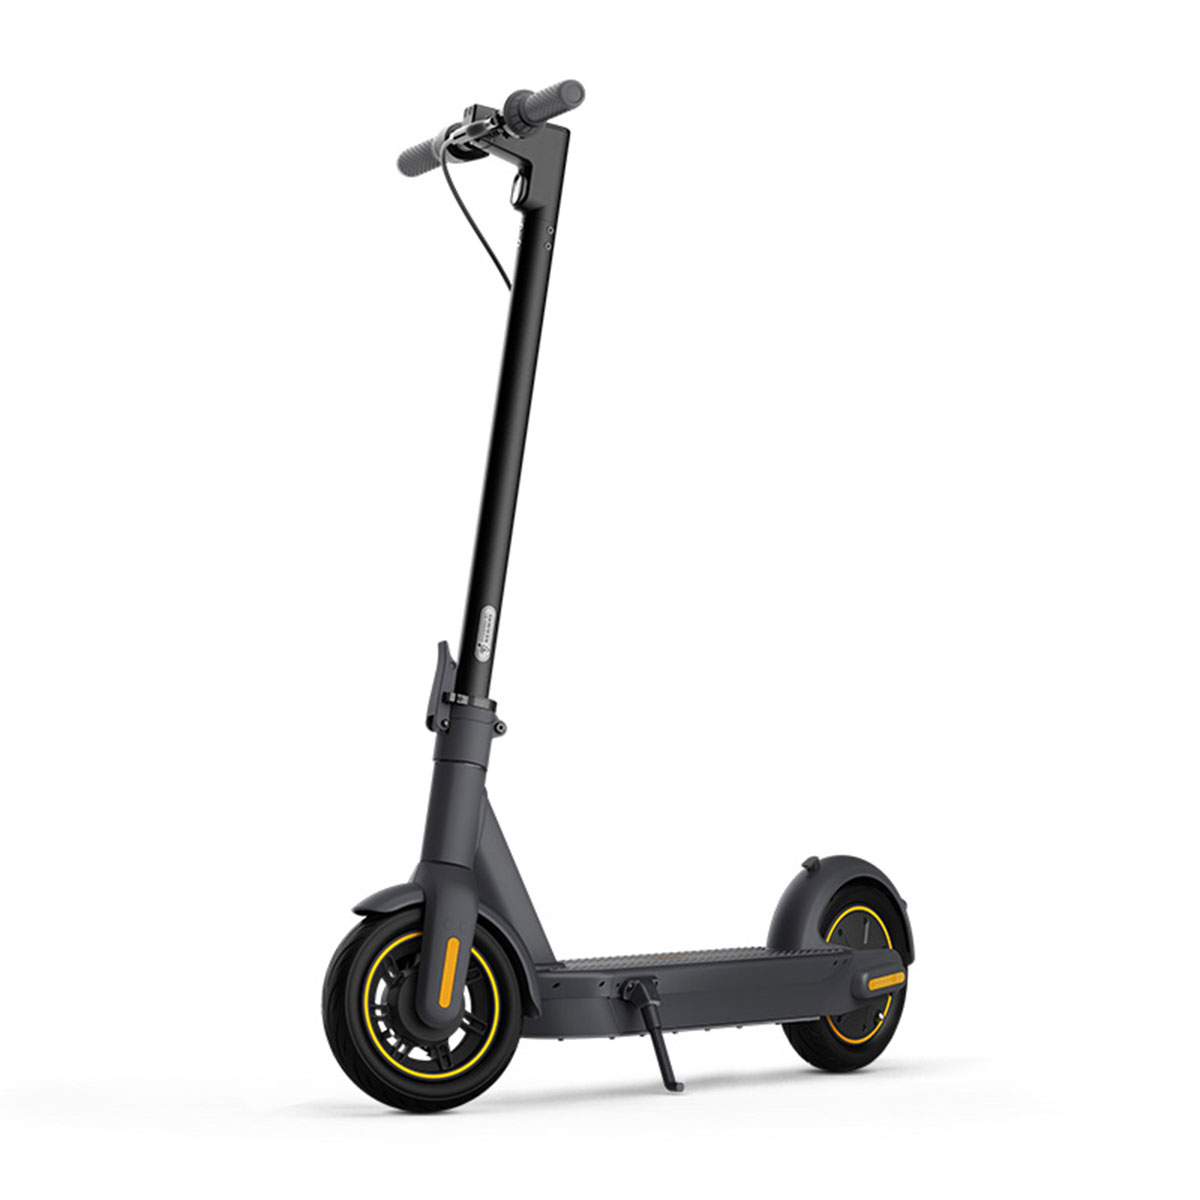 Ninebot 九号电动滑板车MAX G30 成人儿童便携折叠电动车体感车4399.00元包邮